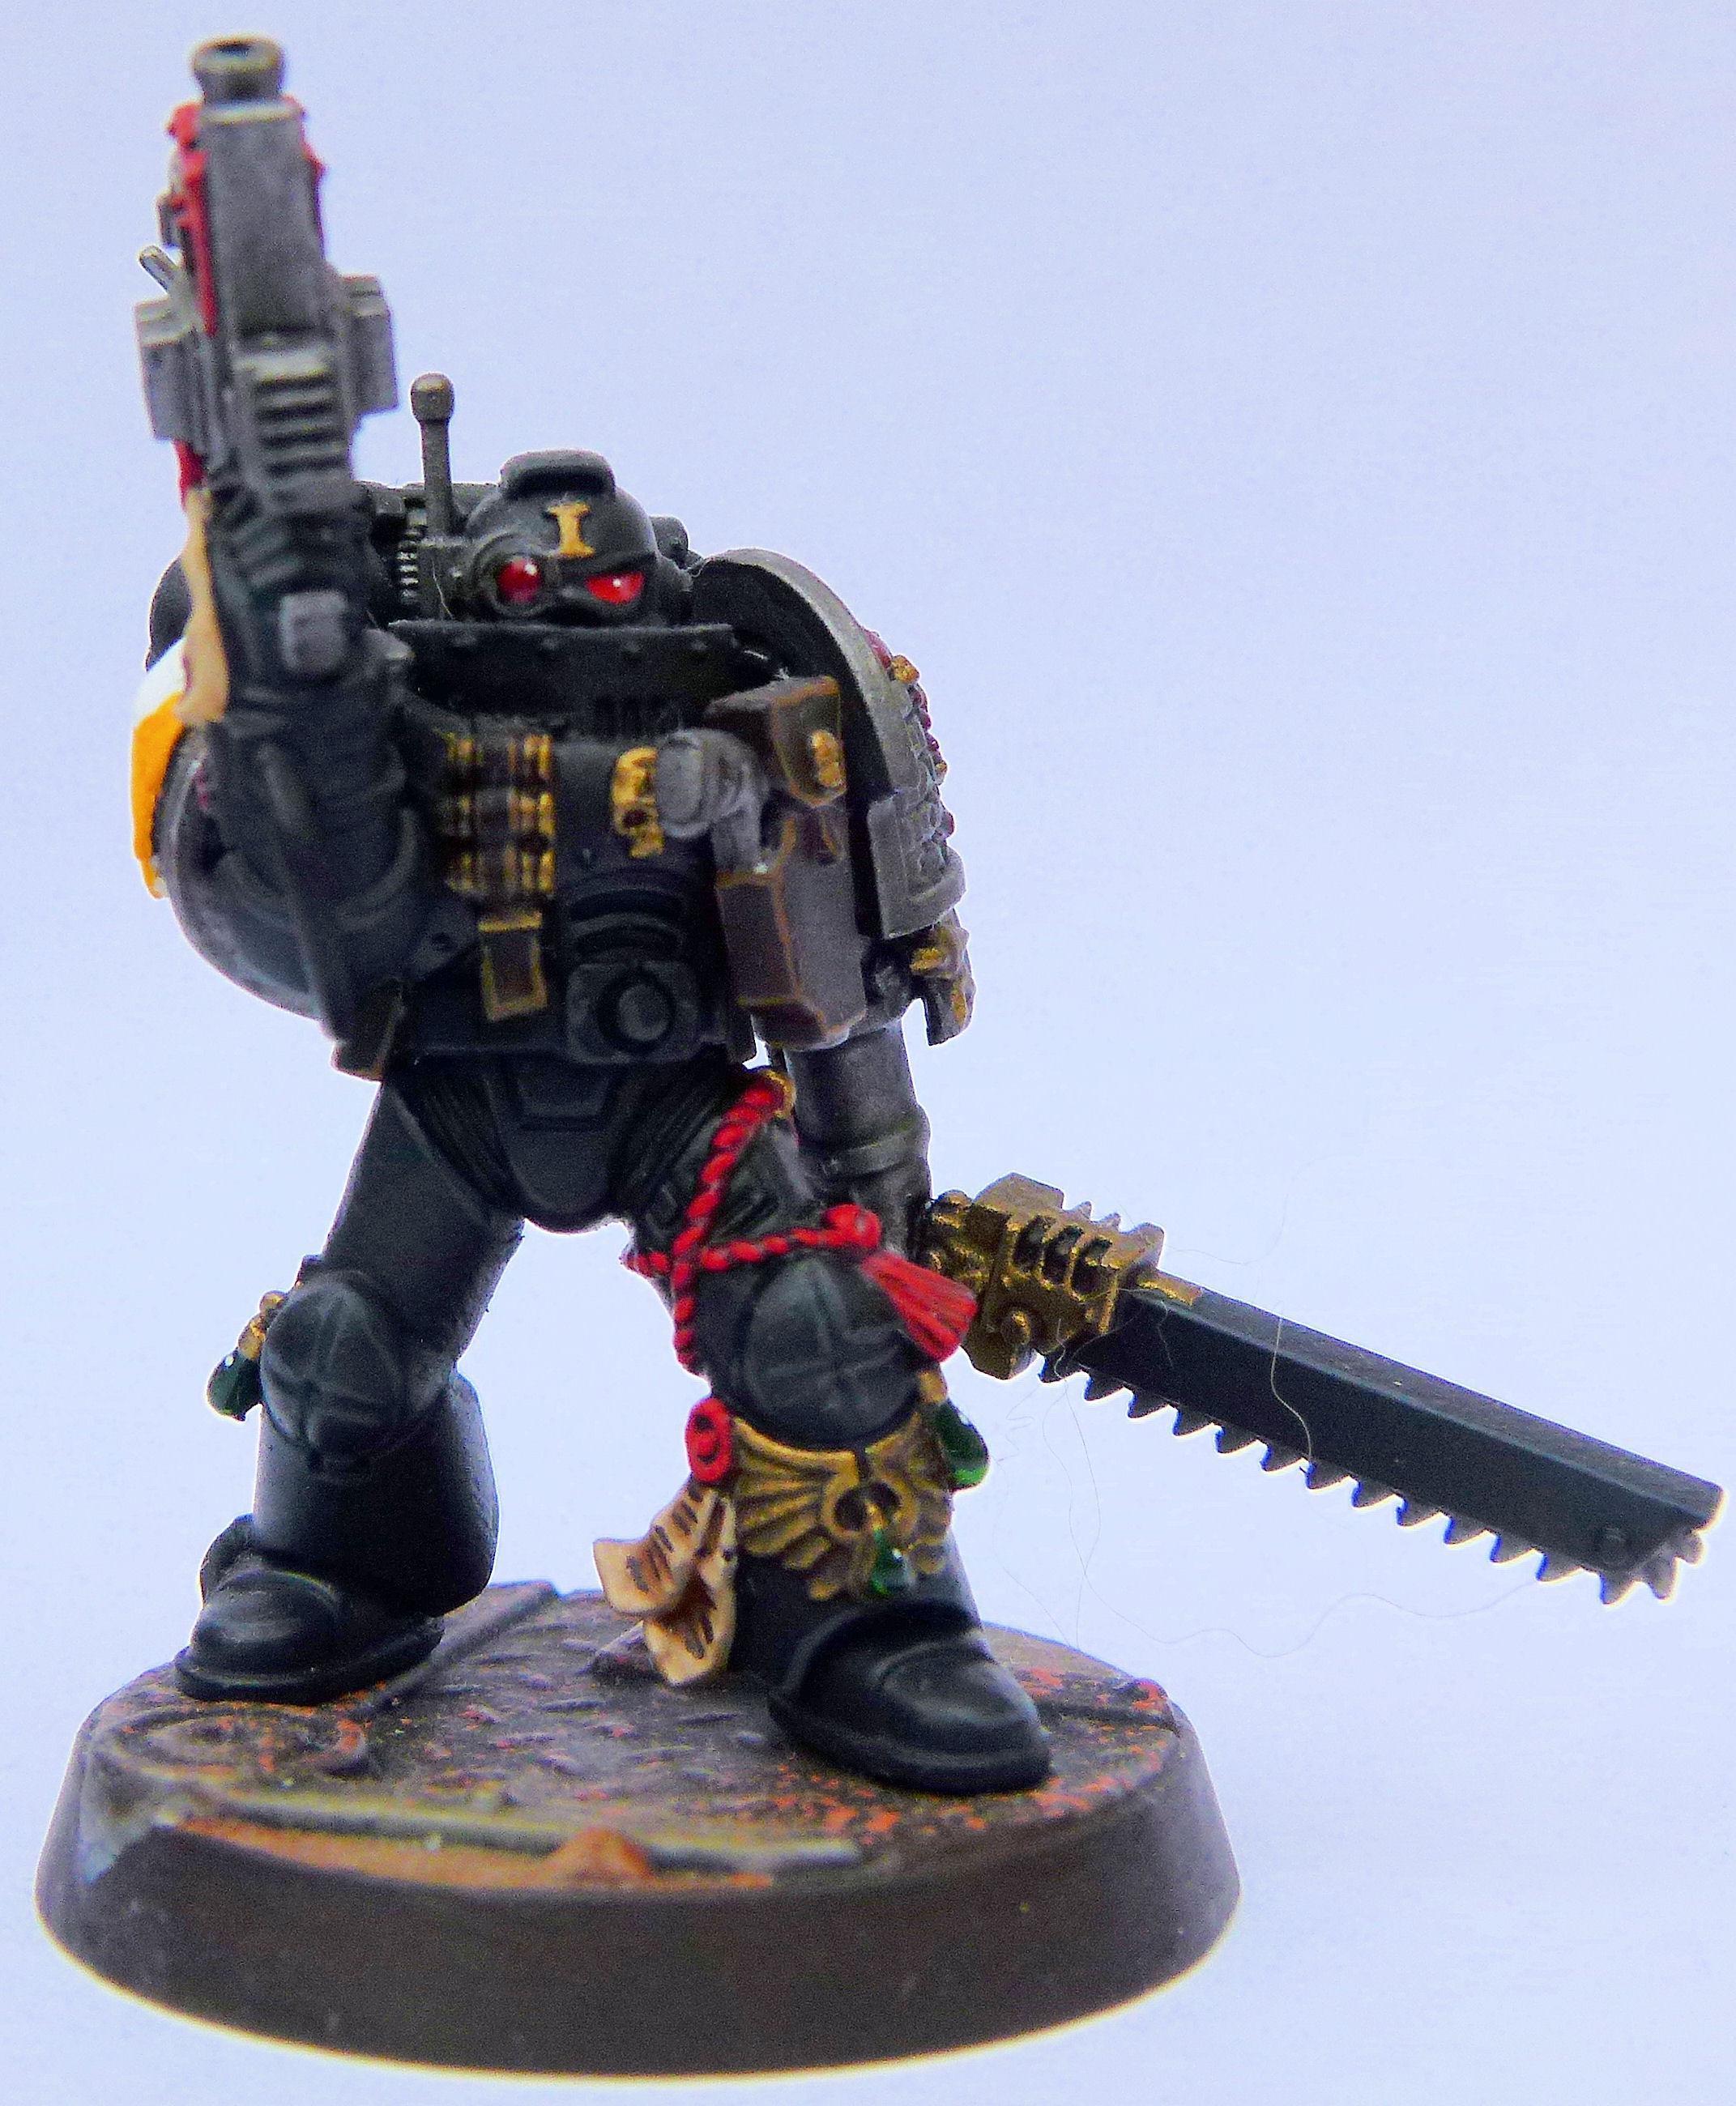 Imperial Harbringers Deathwatch Veteran Front